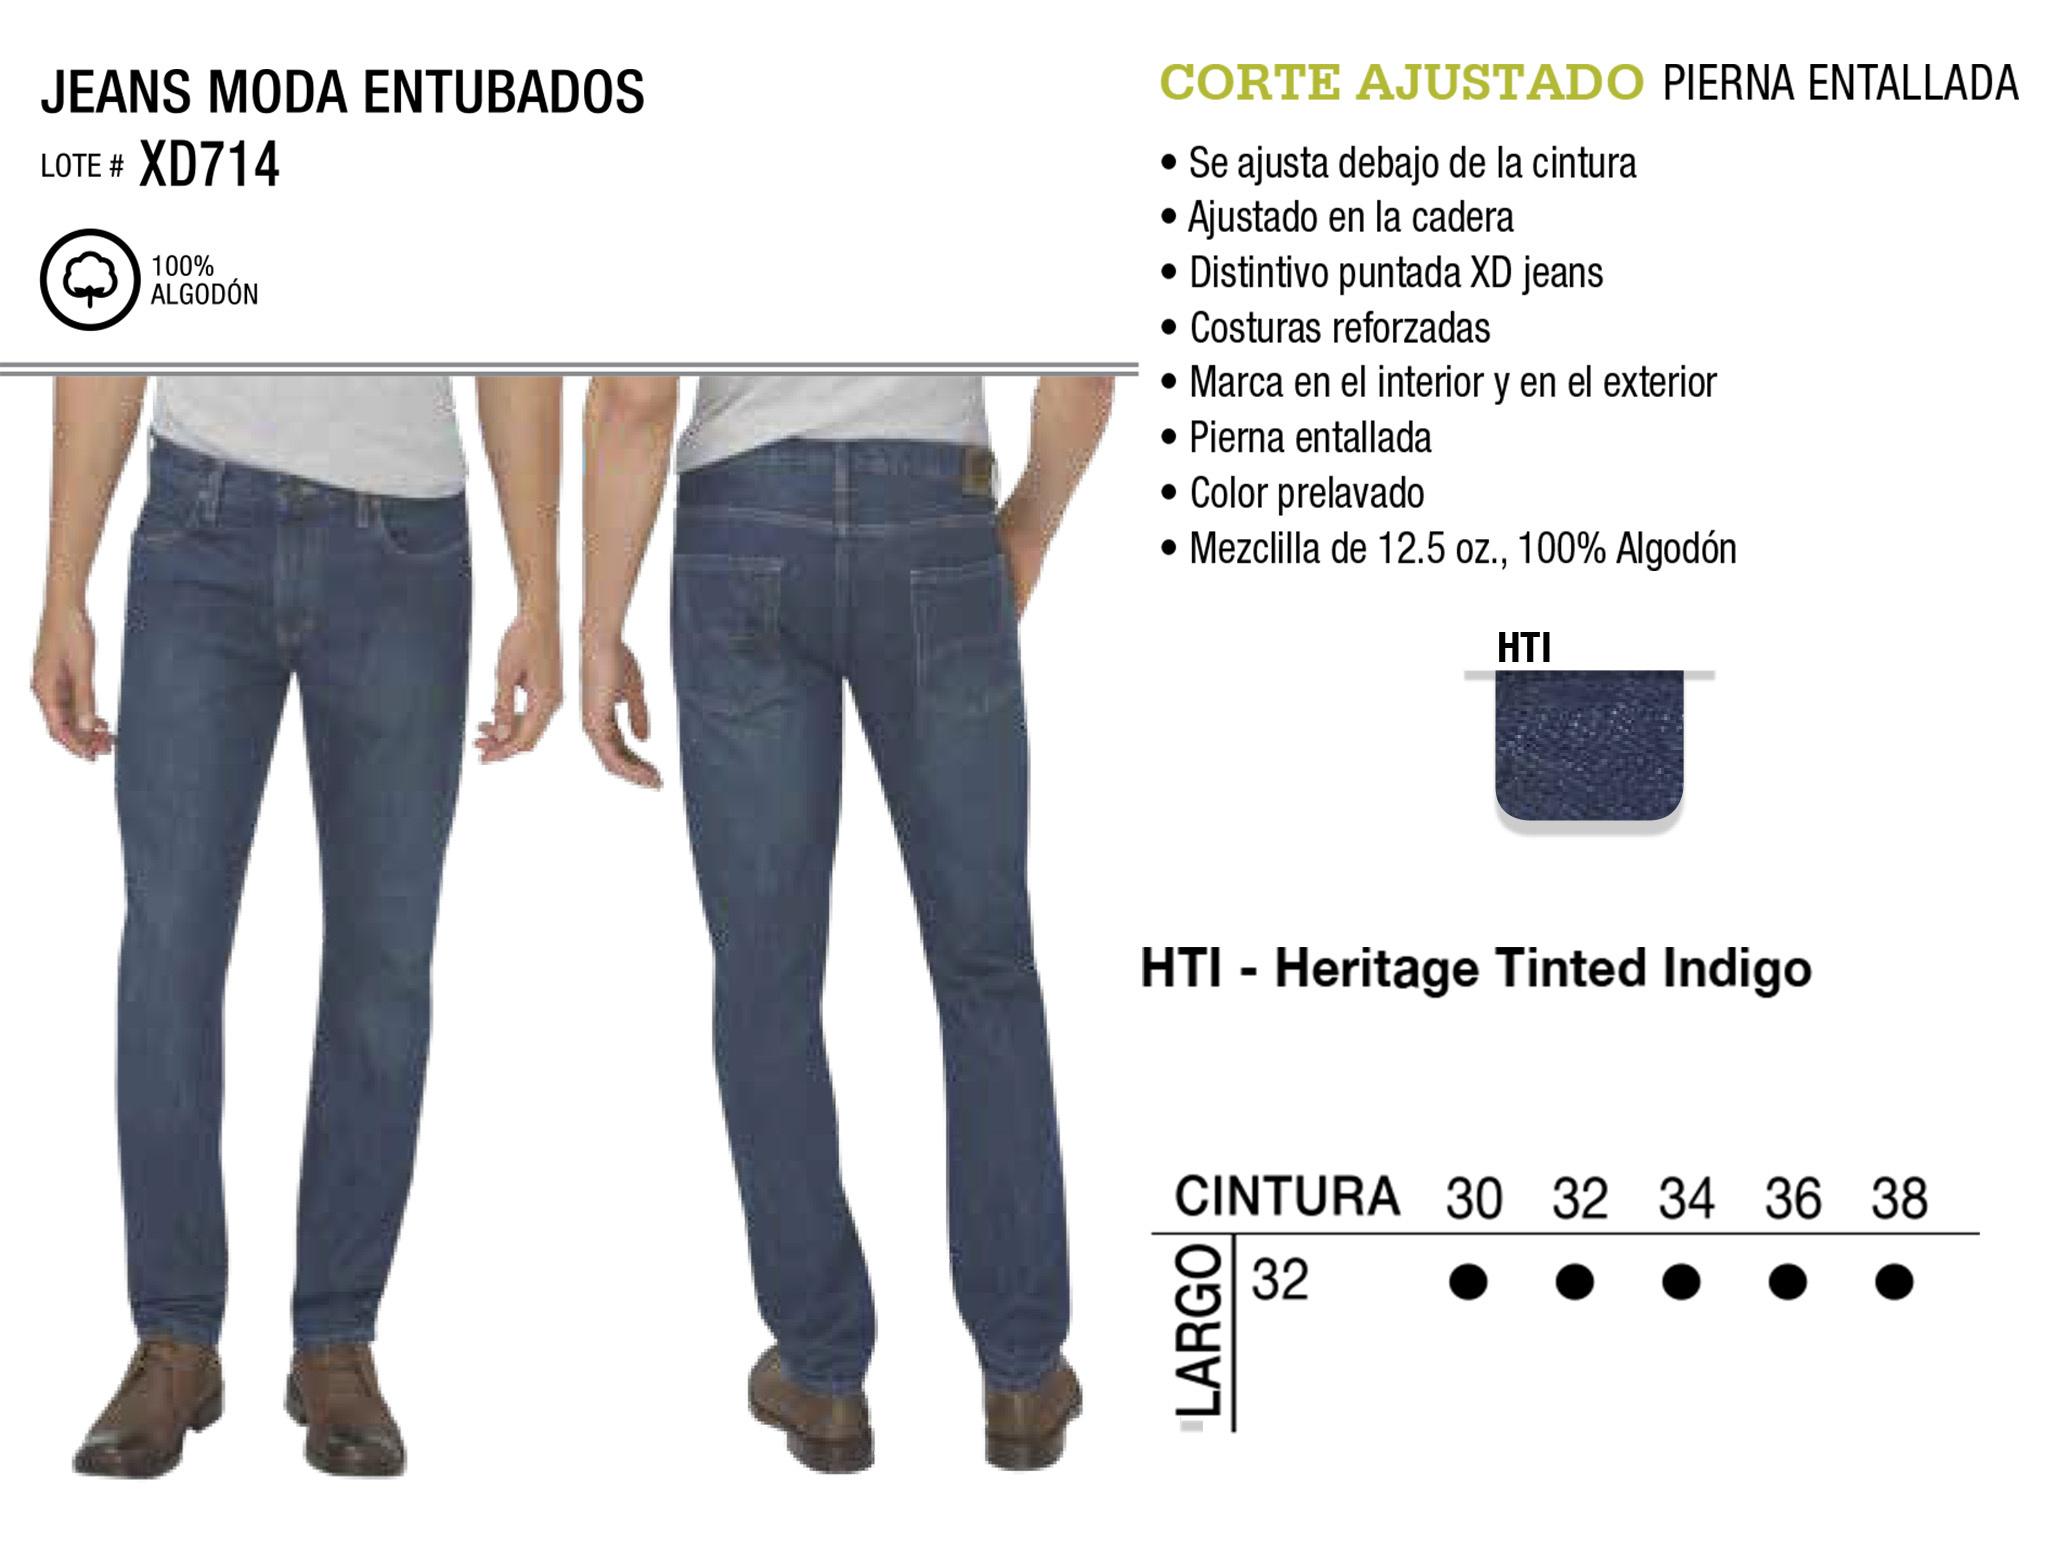 Jeans Moda Entubados. Corte Ajustado. XD714.